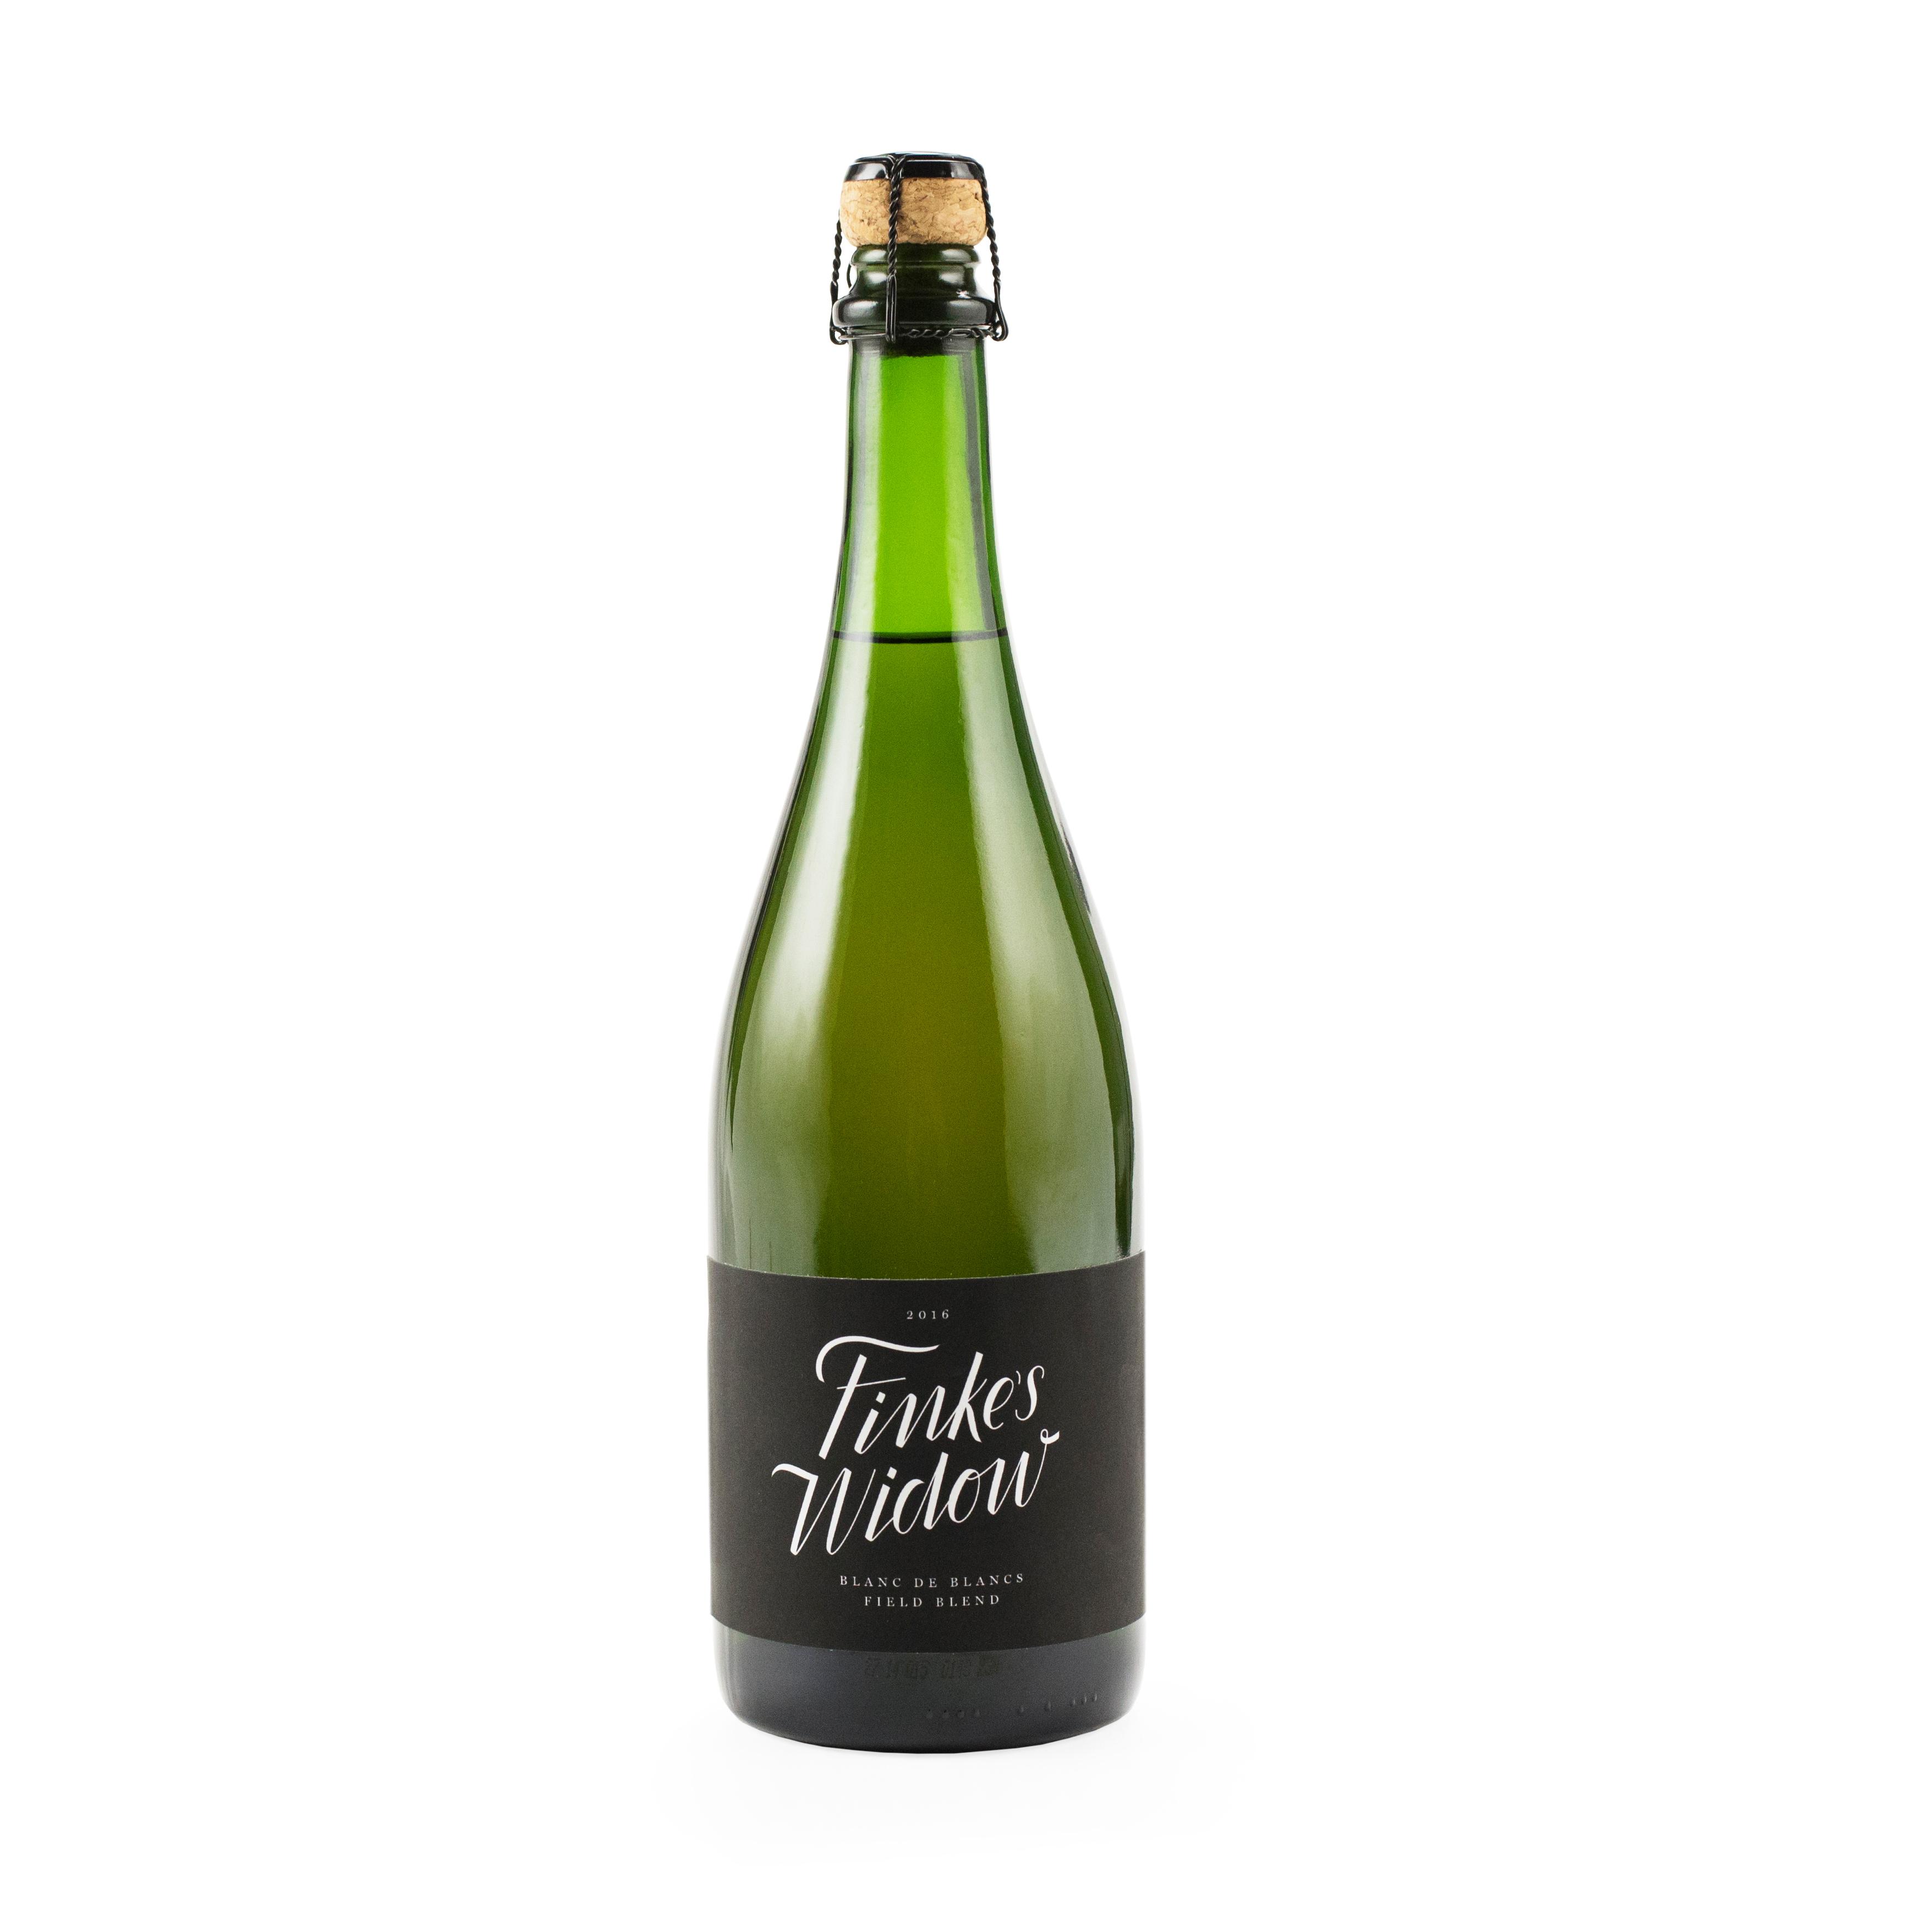 Finke's Widow Winc Champagne